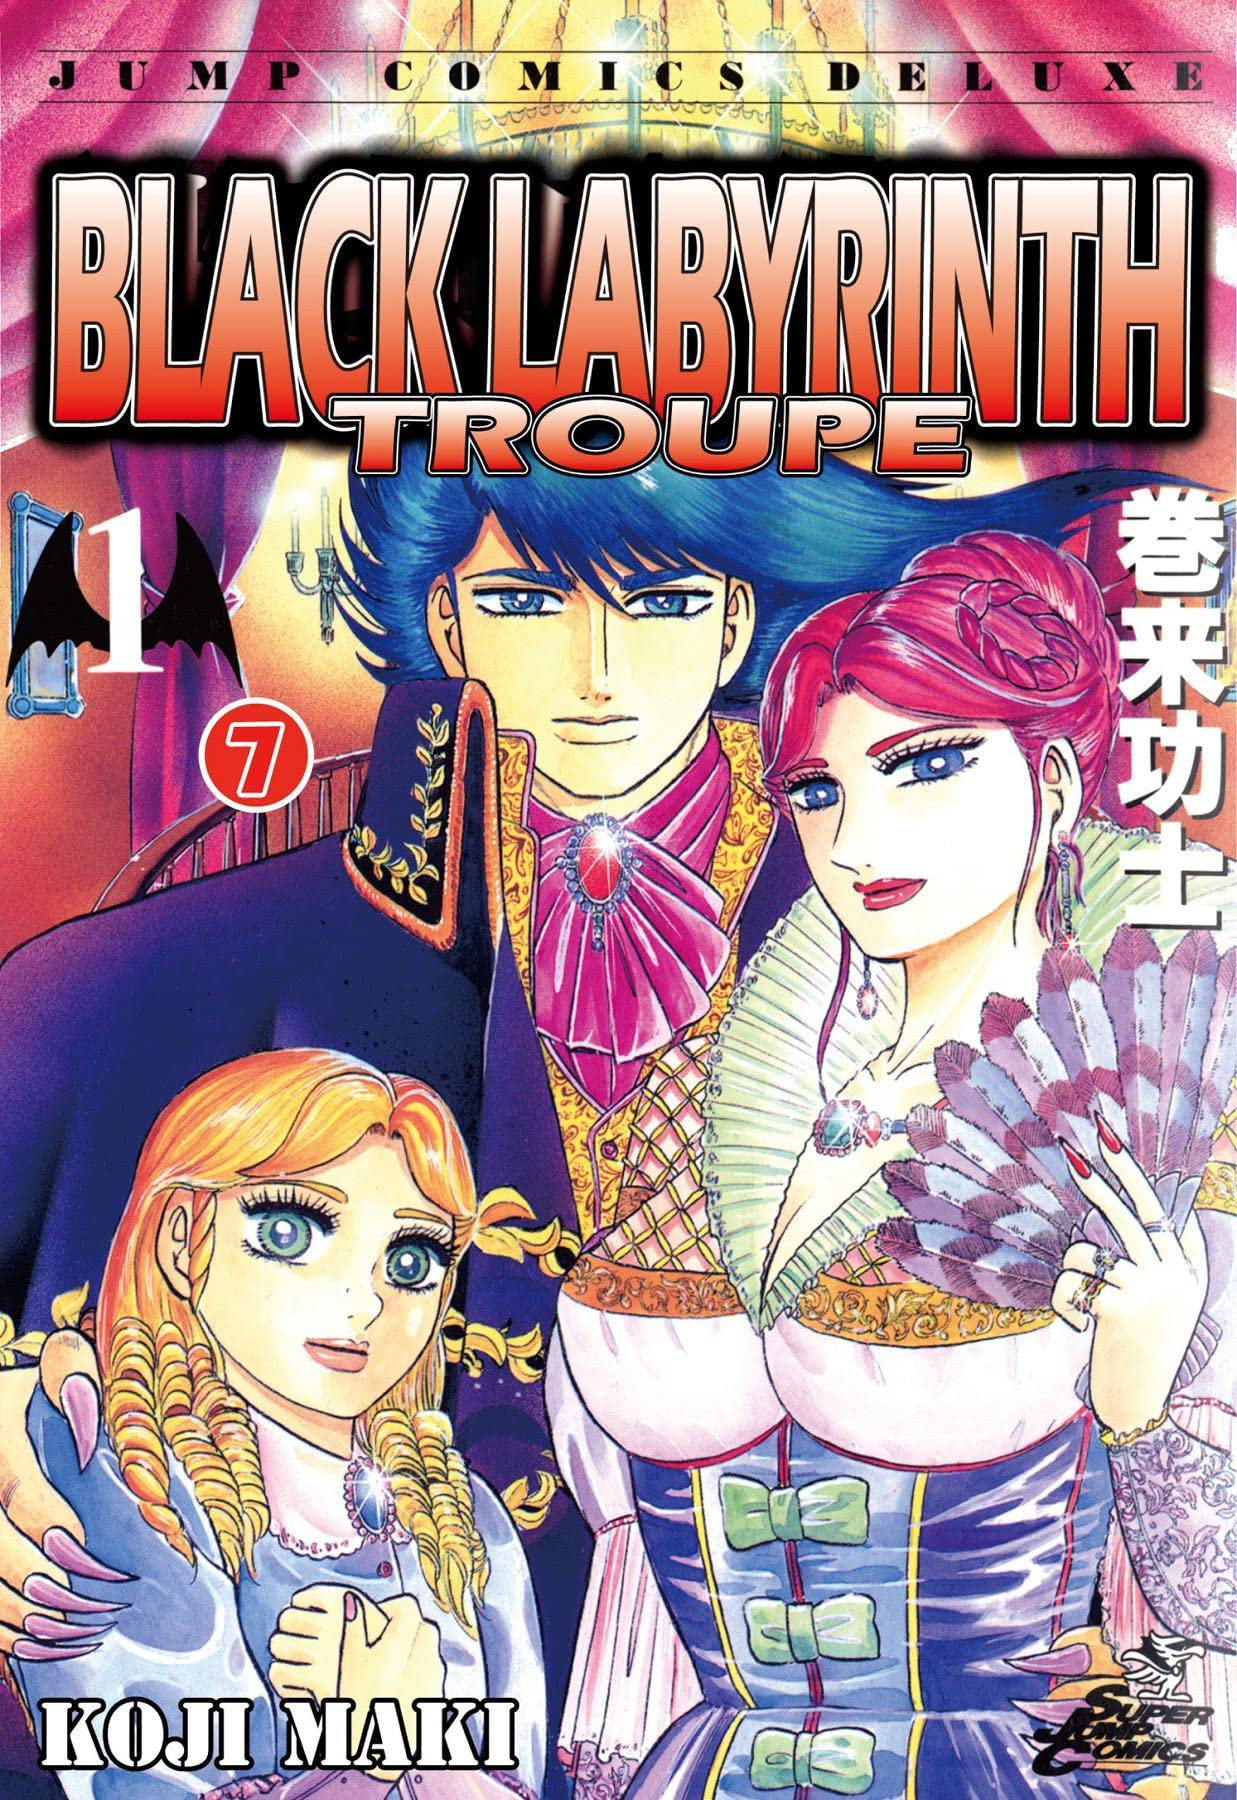 BLACK LABYRINTH TROUPE #7